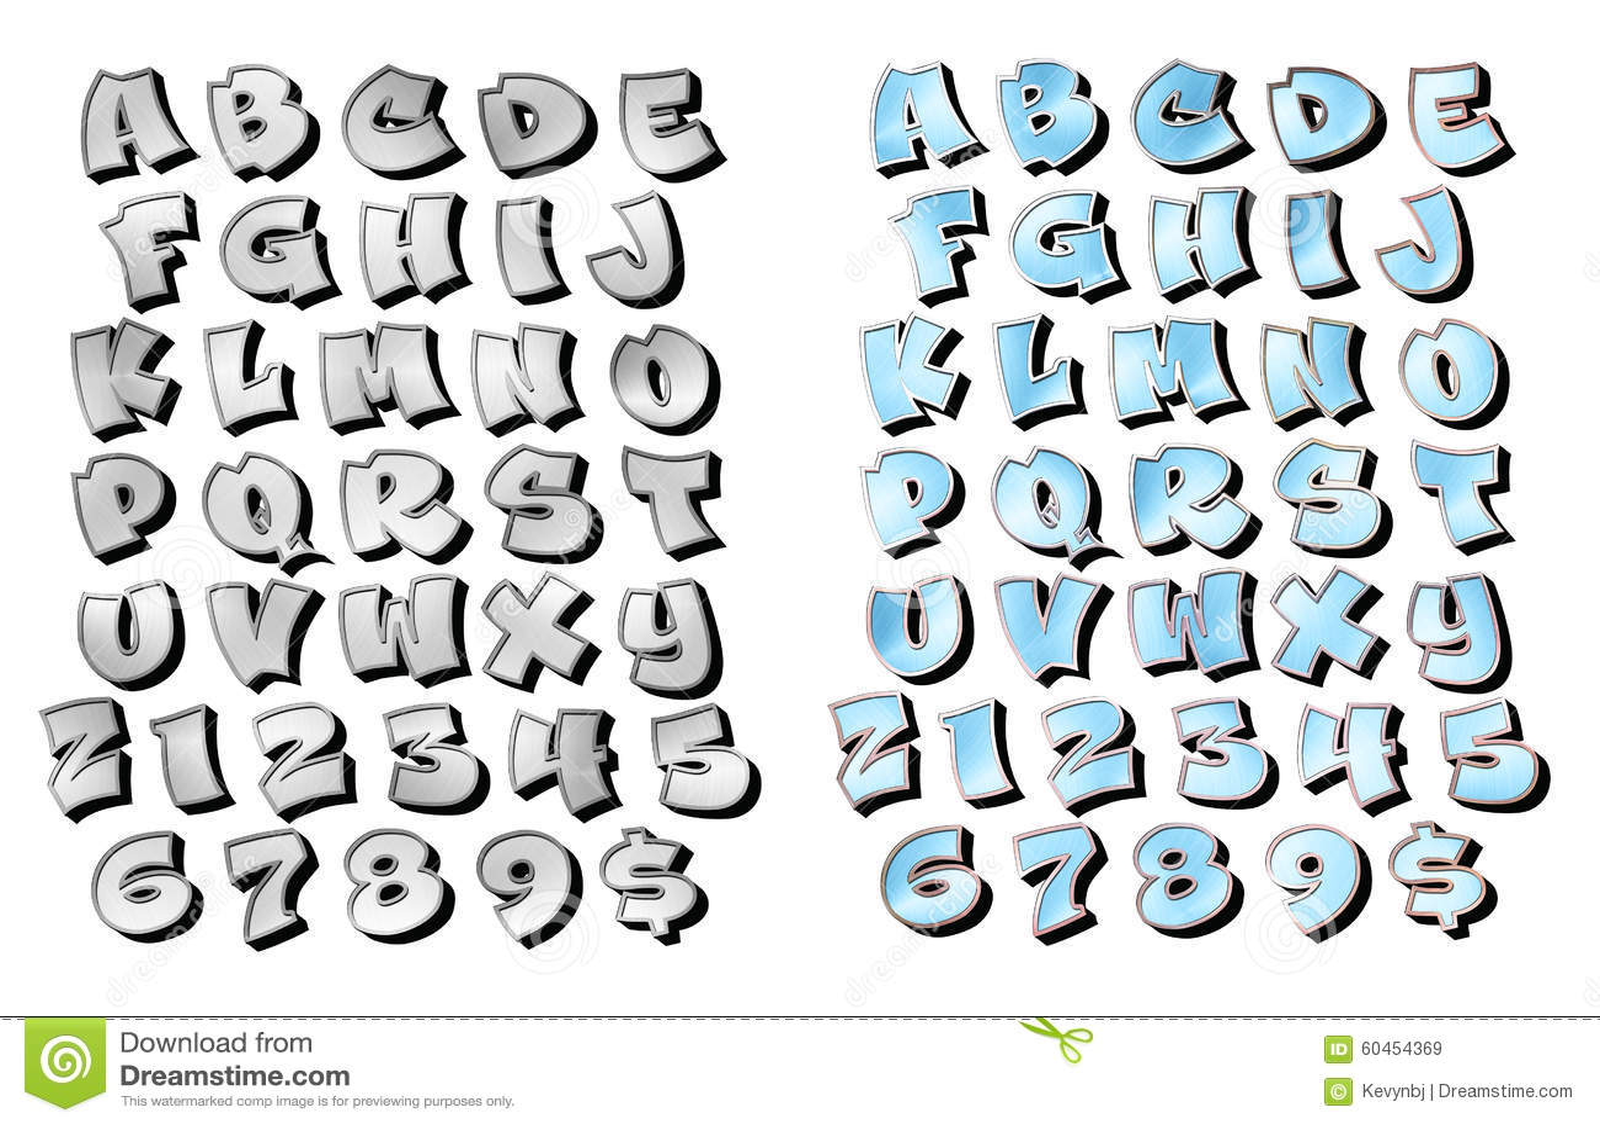 Graffiti lettering stock illustrations 10344 graffiti lettering stock illustrations vectors clipart dreamstime